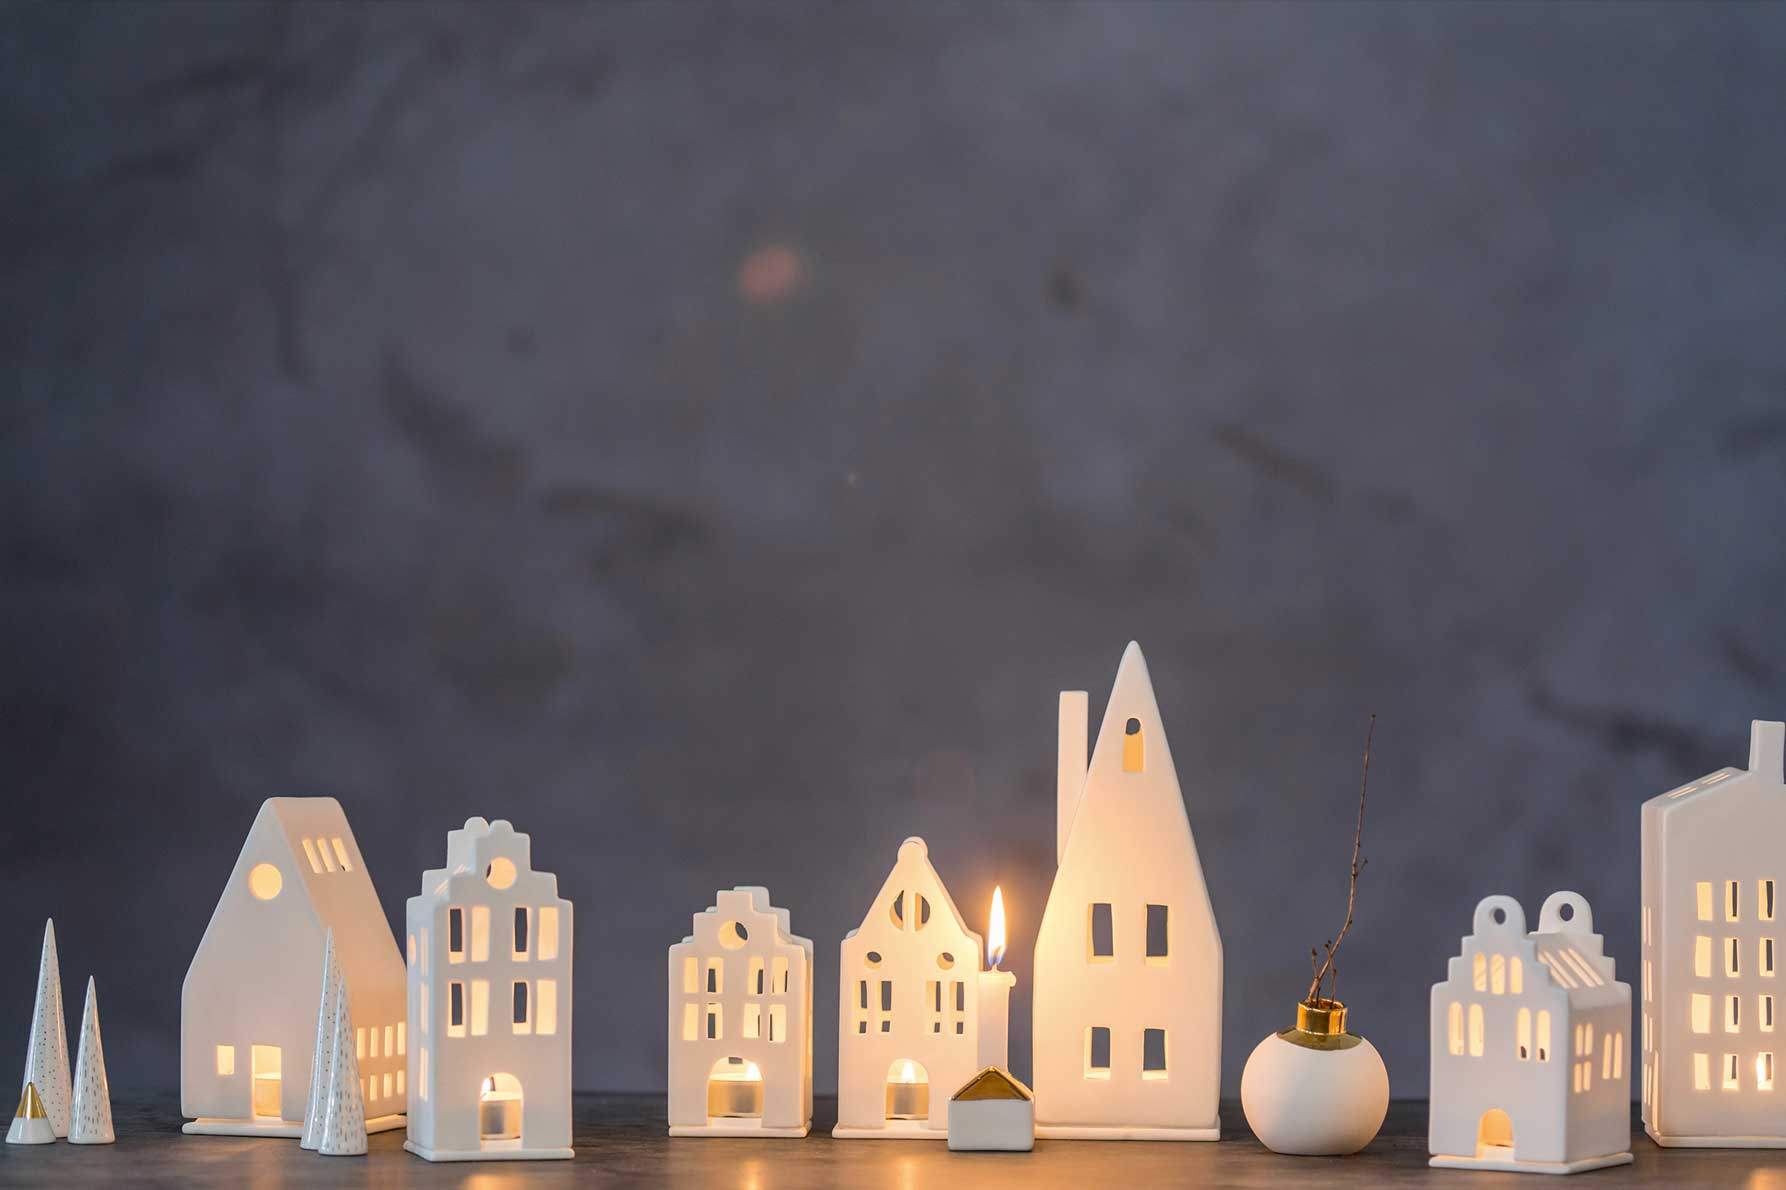 weihnachtskollektion r der. Black Bedroom Furniture Sets. Home Design Ideas